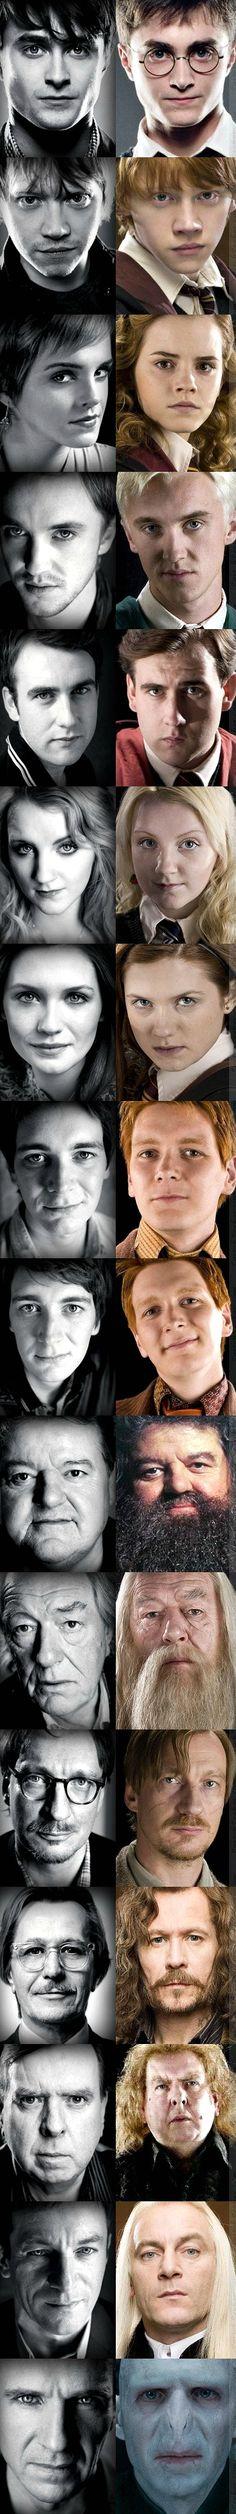 Vanna, Weasly's, Draco, Harry Dumbledor, Hagrid and Petegrew look most alike